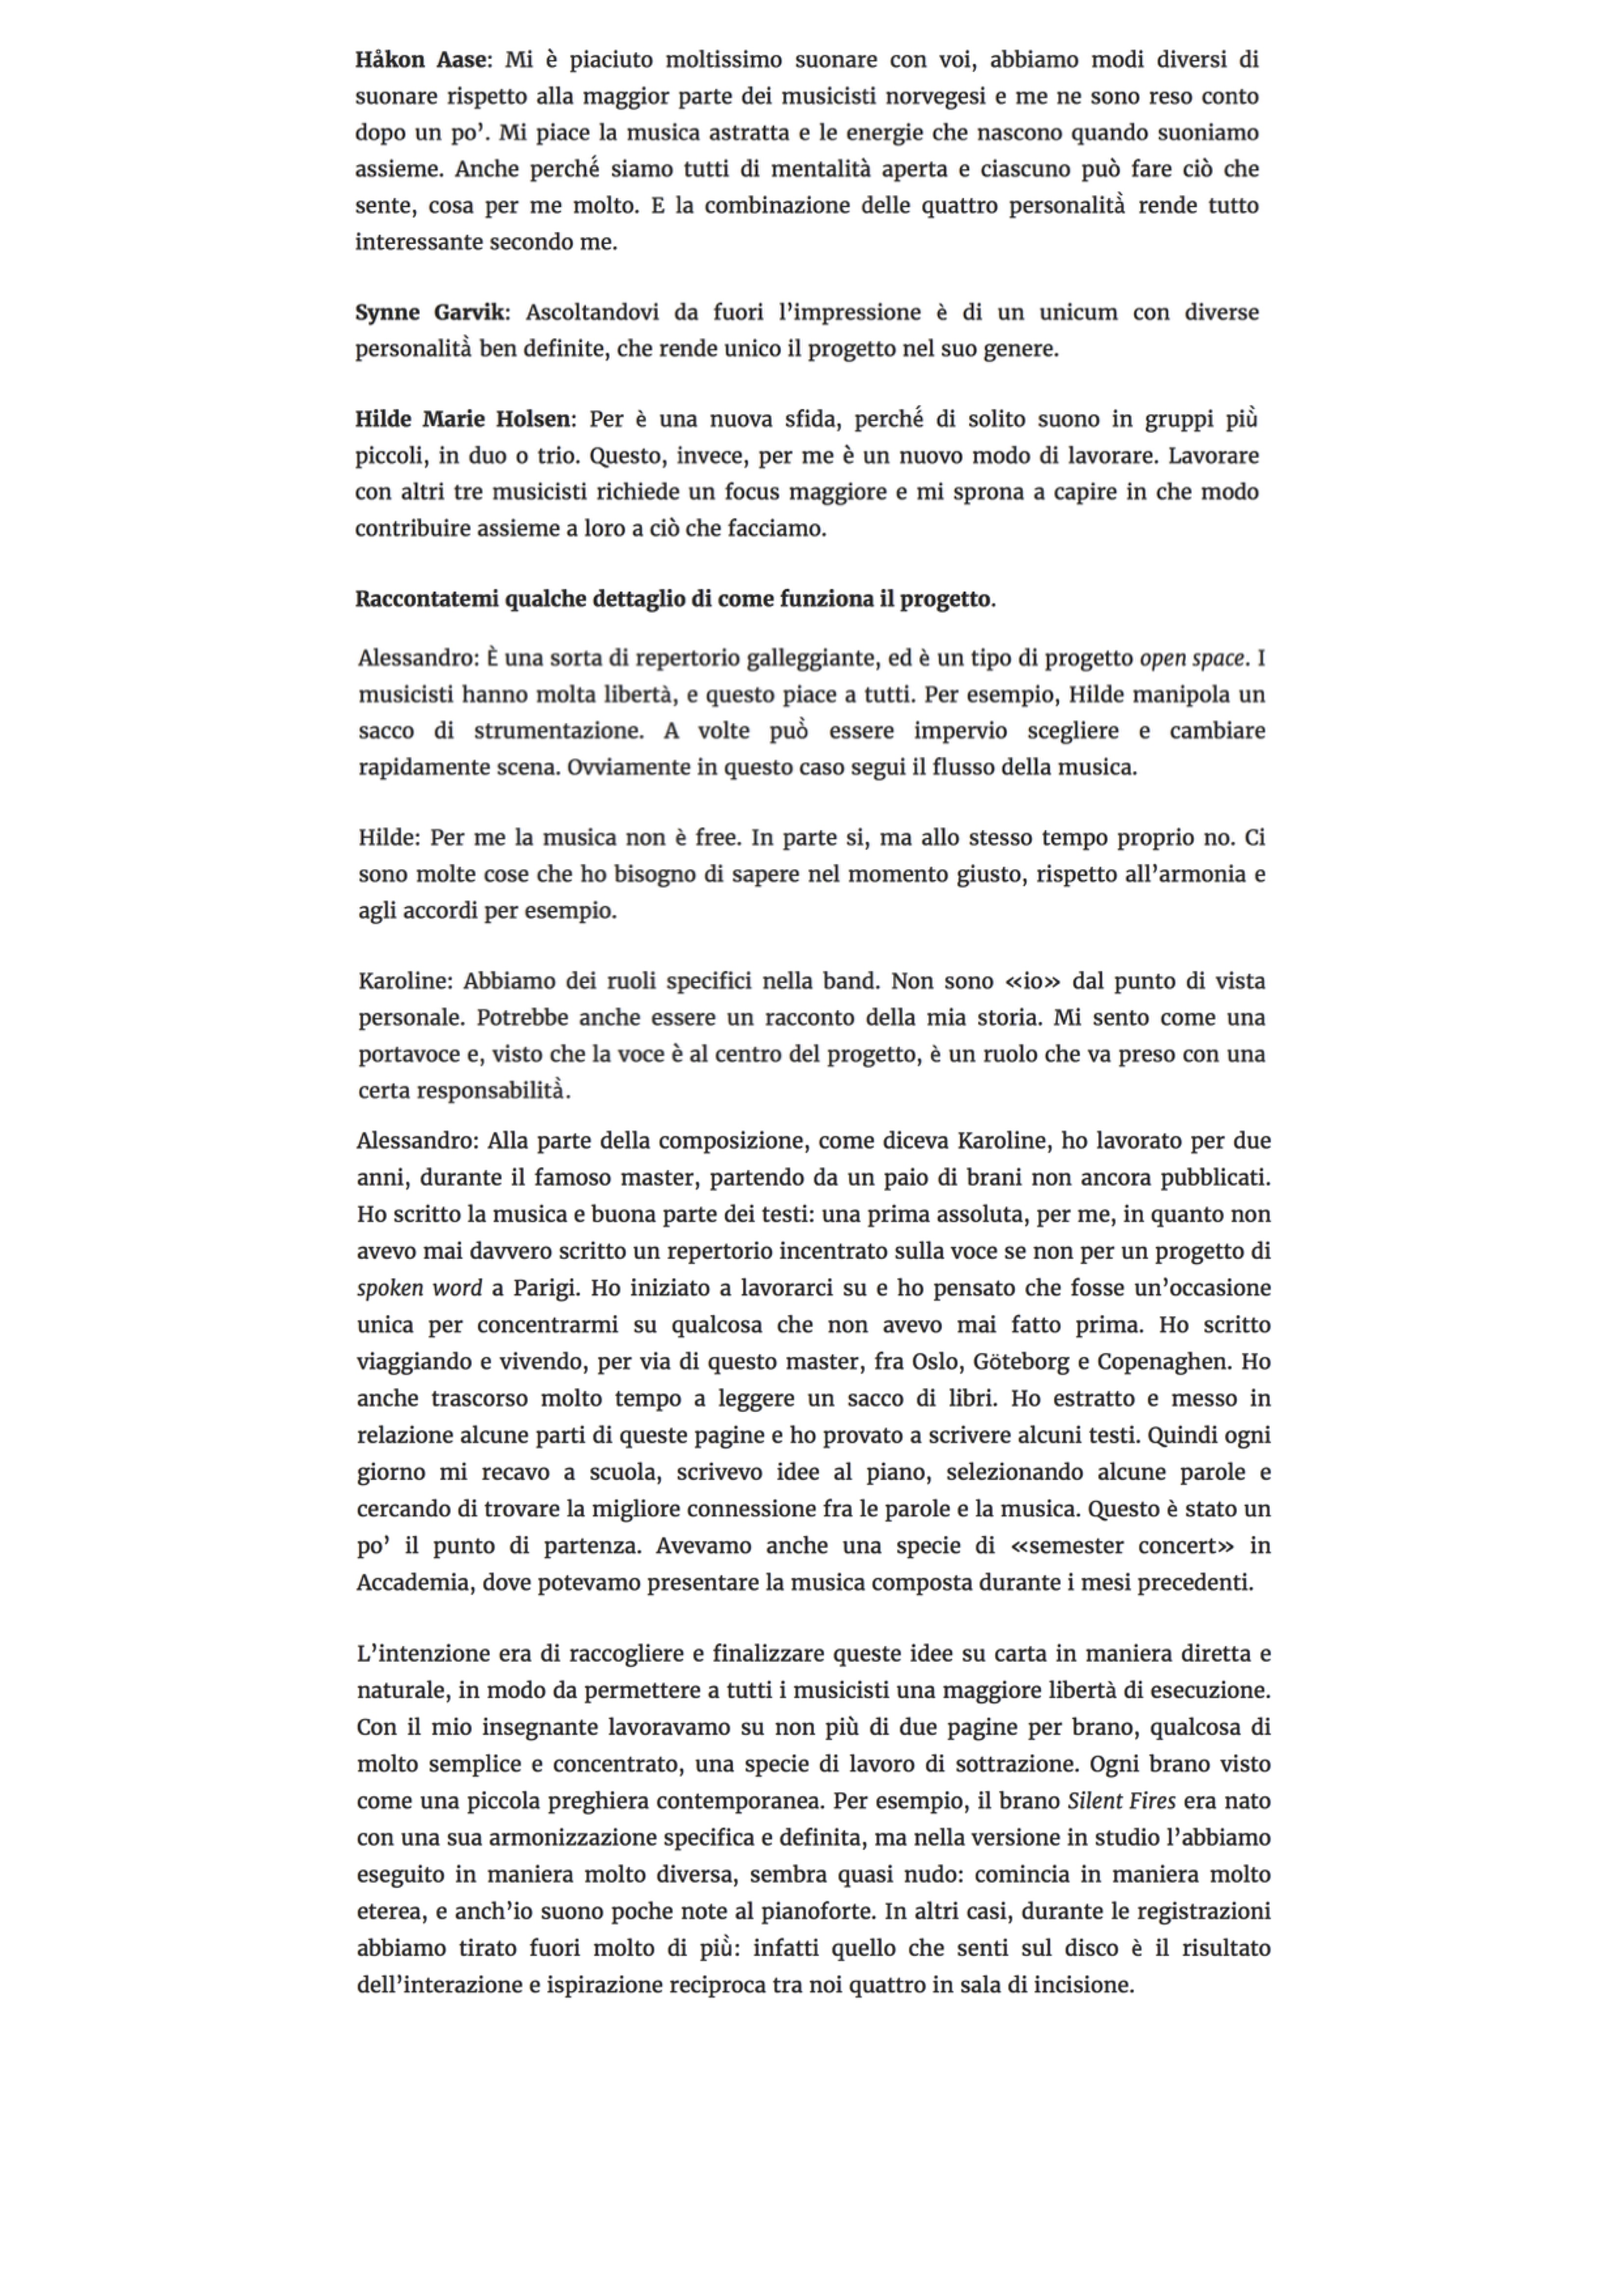 Forests - Interview Musica Jazz (11.05.20) 3